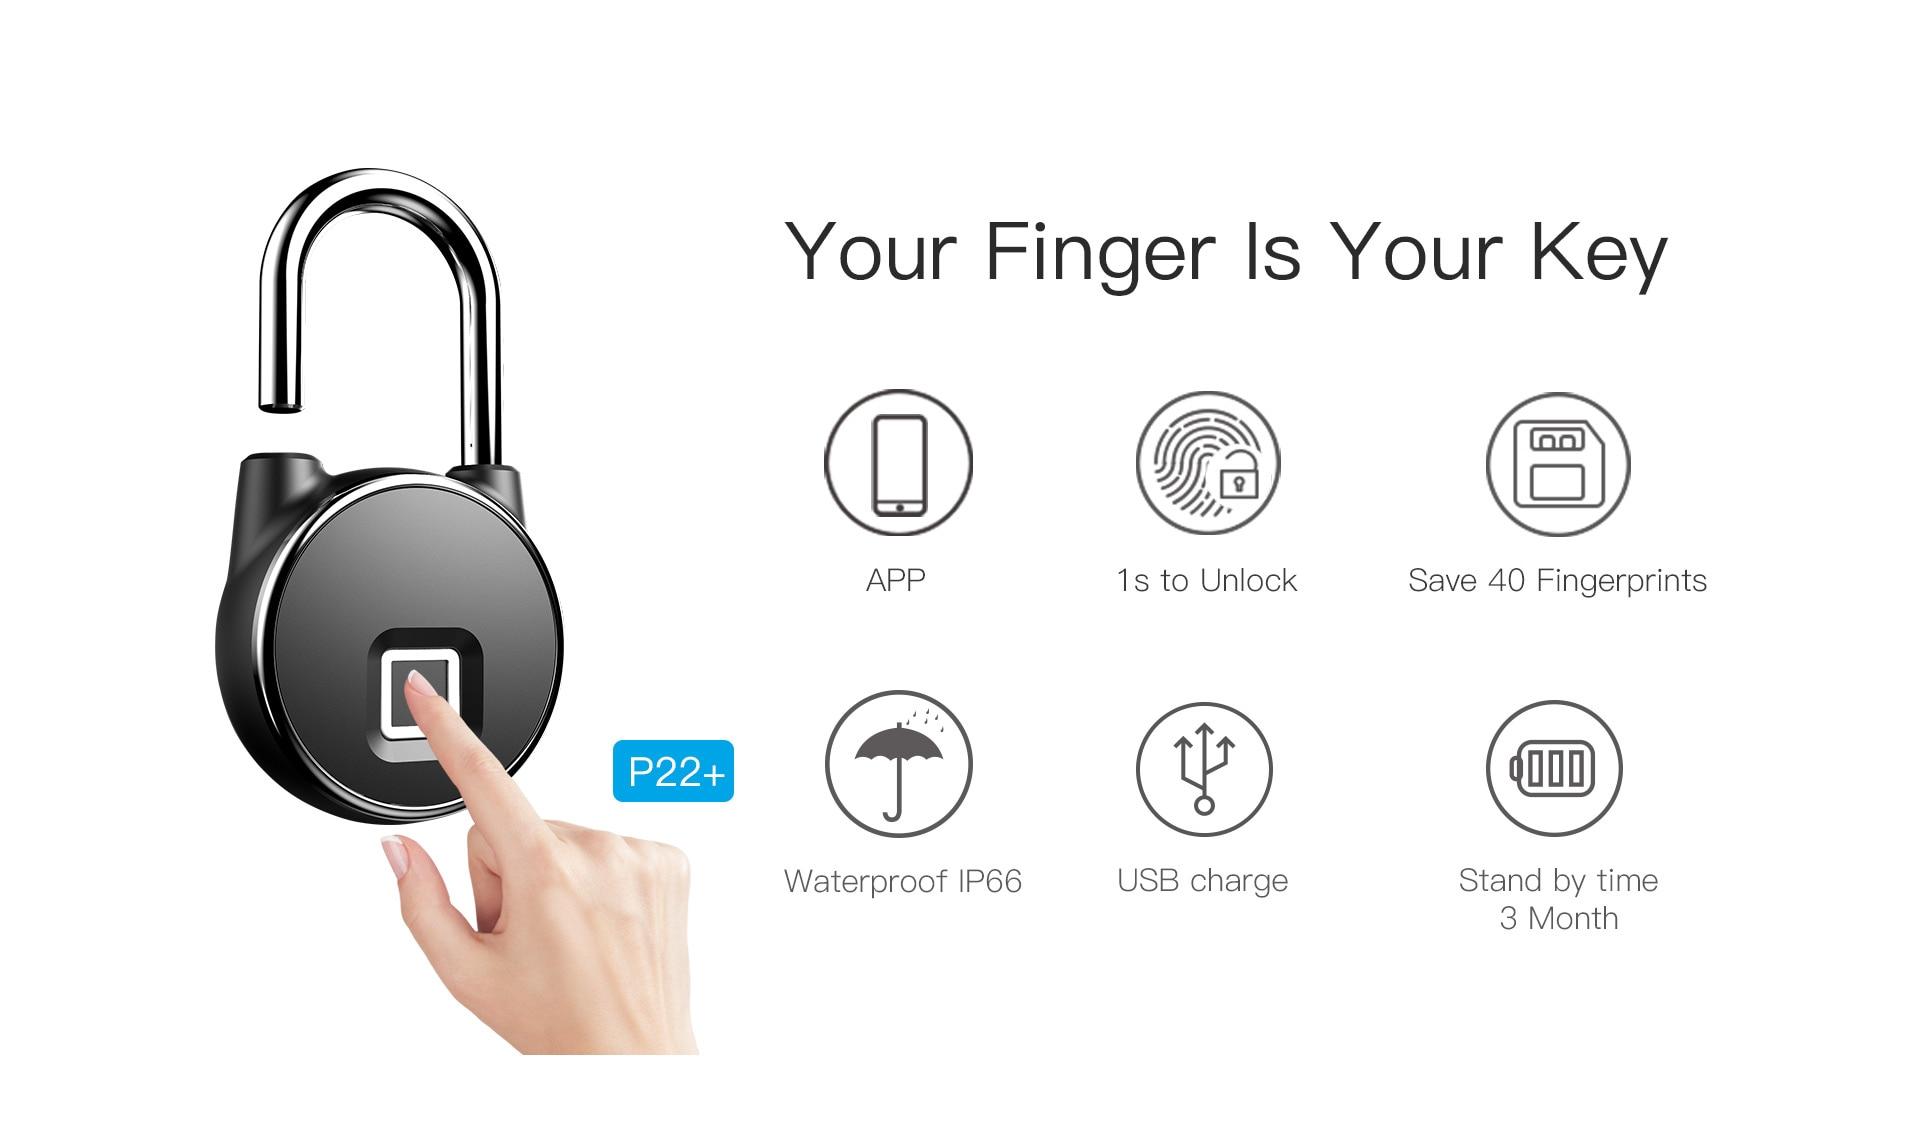 HTB1Z7tzXlCw3KVjSZFuq6AAOpXa8 Portable bluetooth Lock Smart Padlock Keyless Fingerprint Lock Anti-Theft Security Door Padlocks for Bag Drawer Suitcase